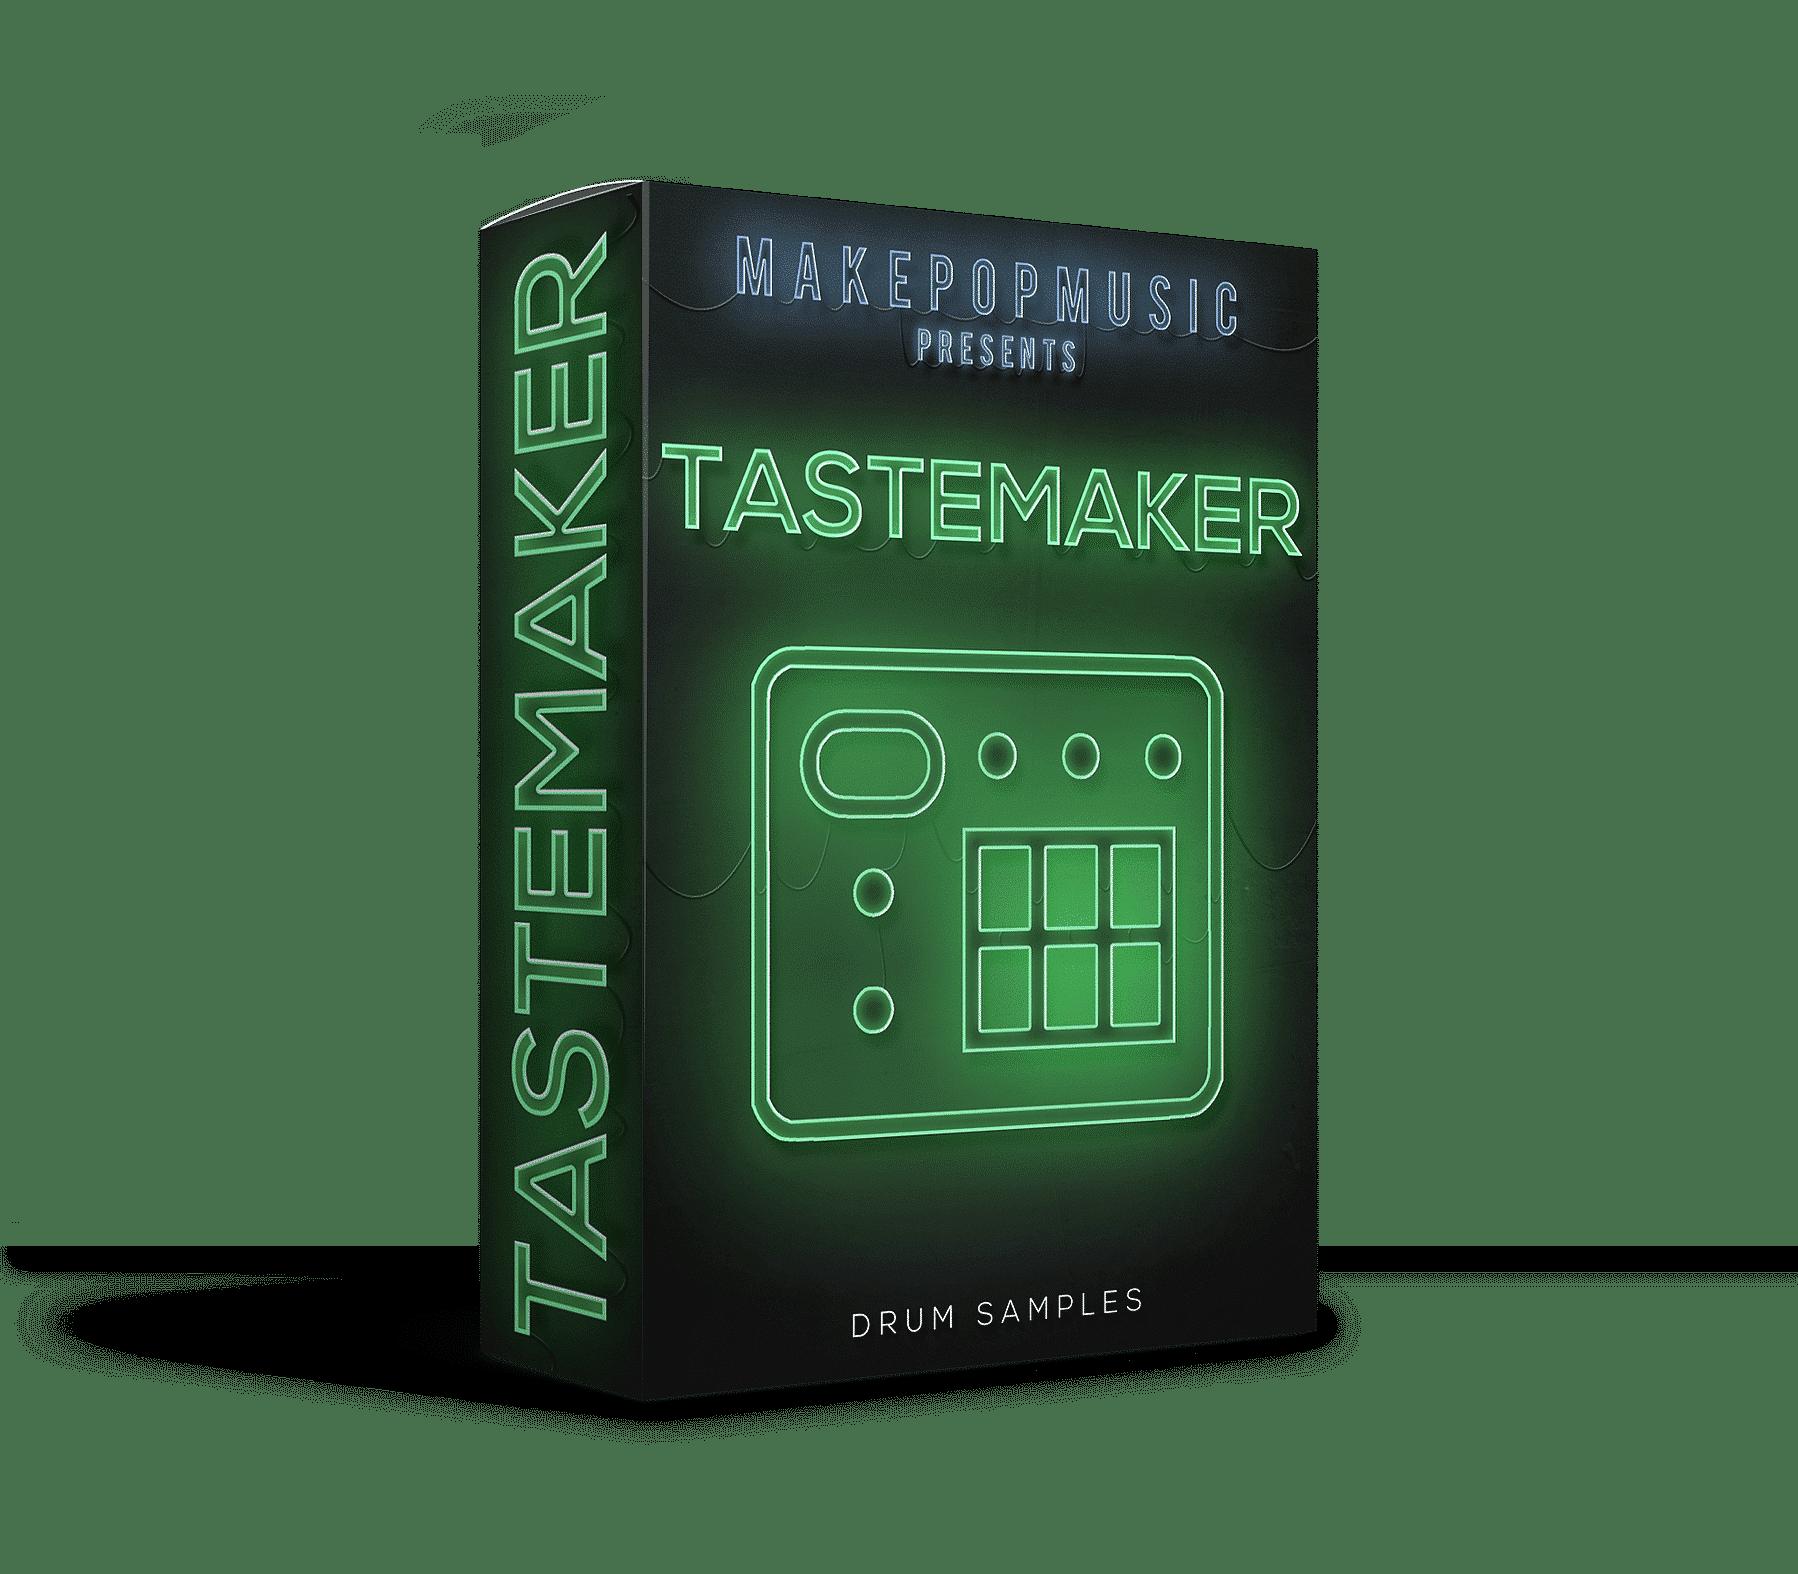 Make Pop Music - Tastemaker